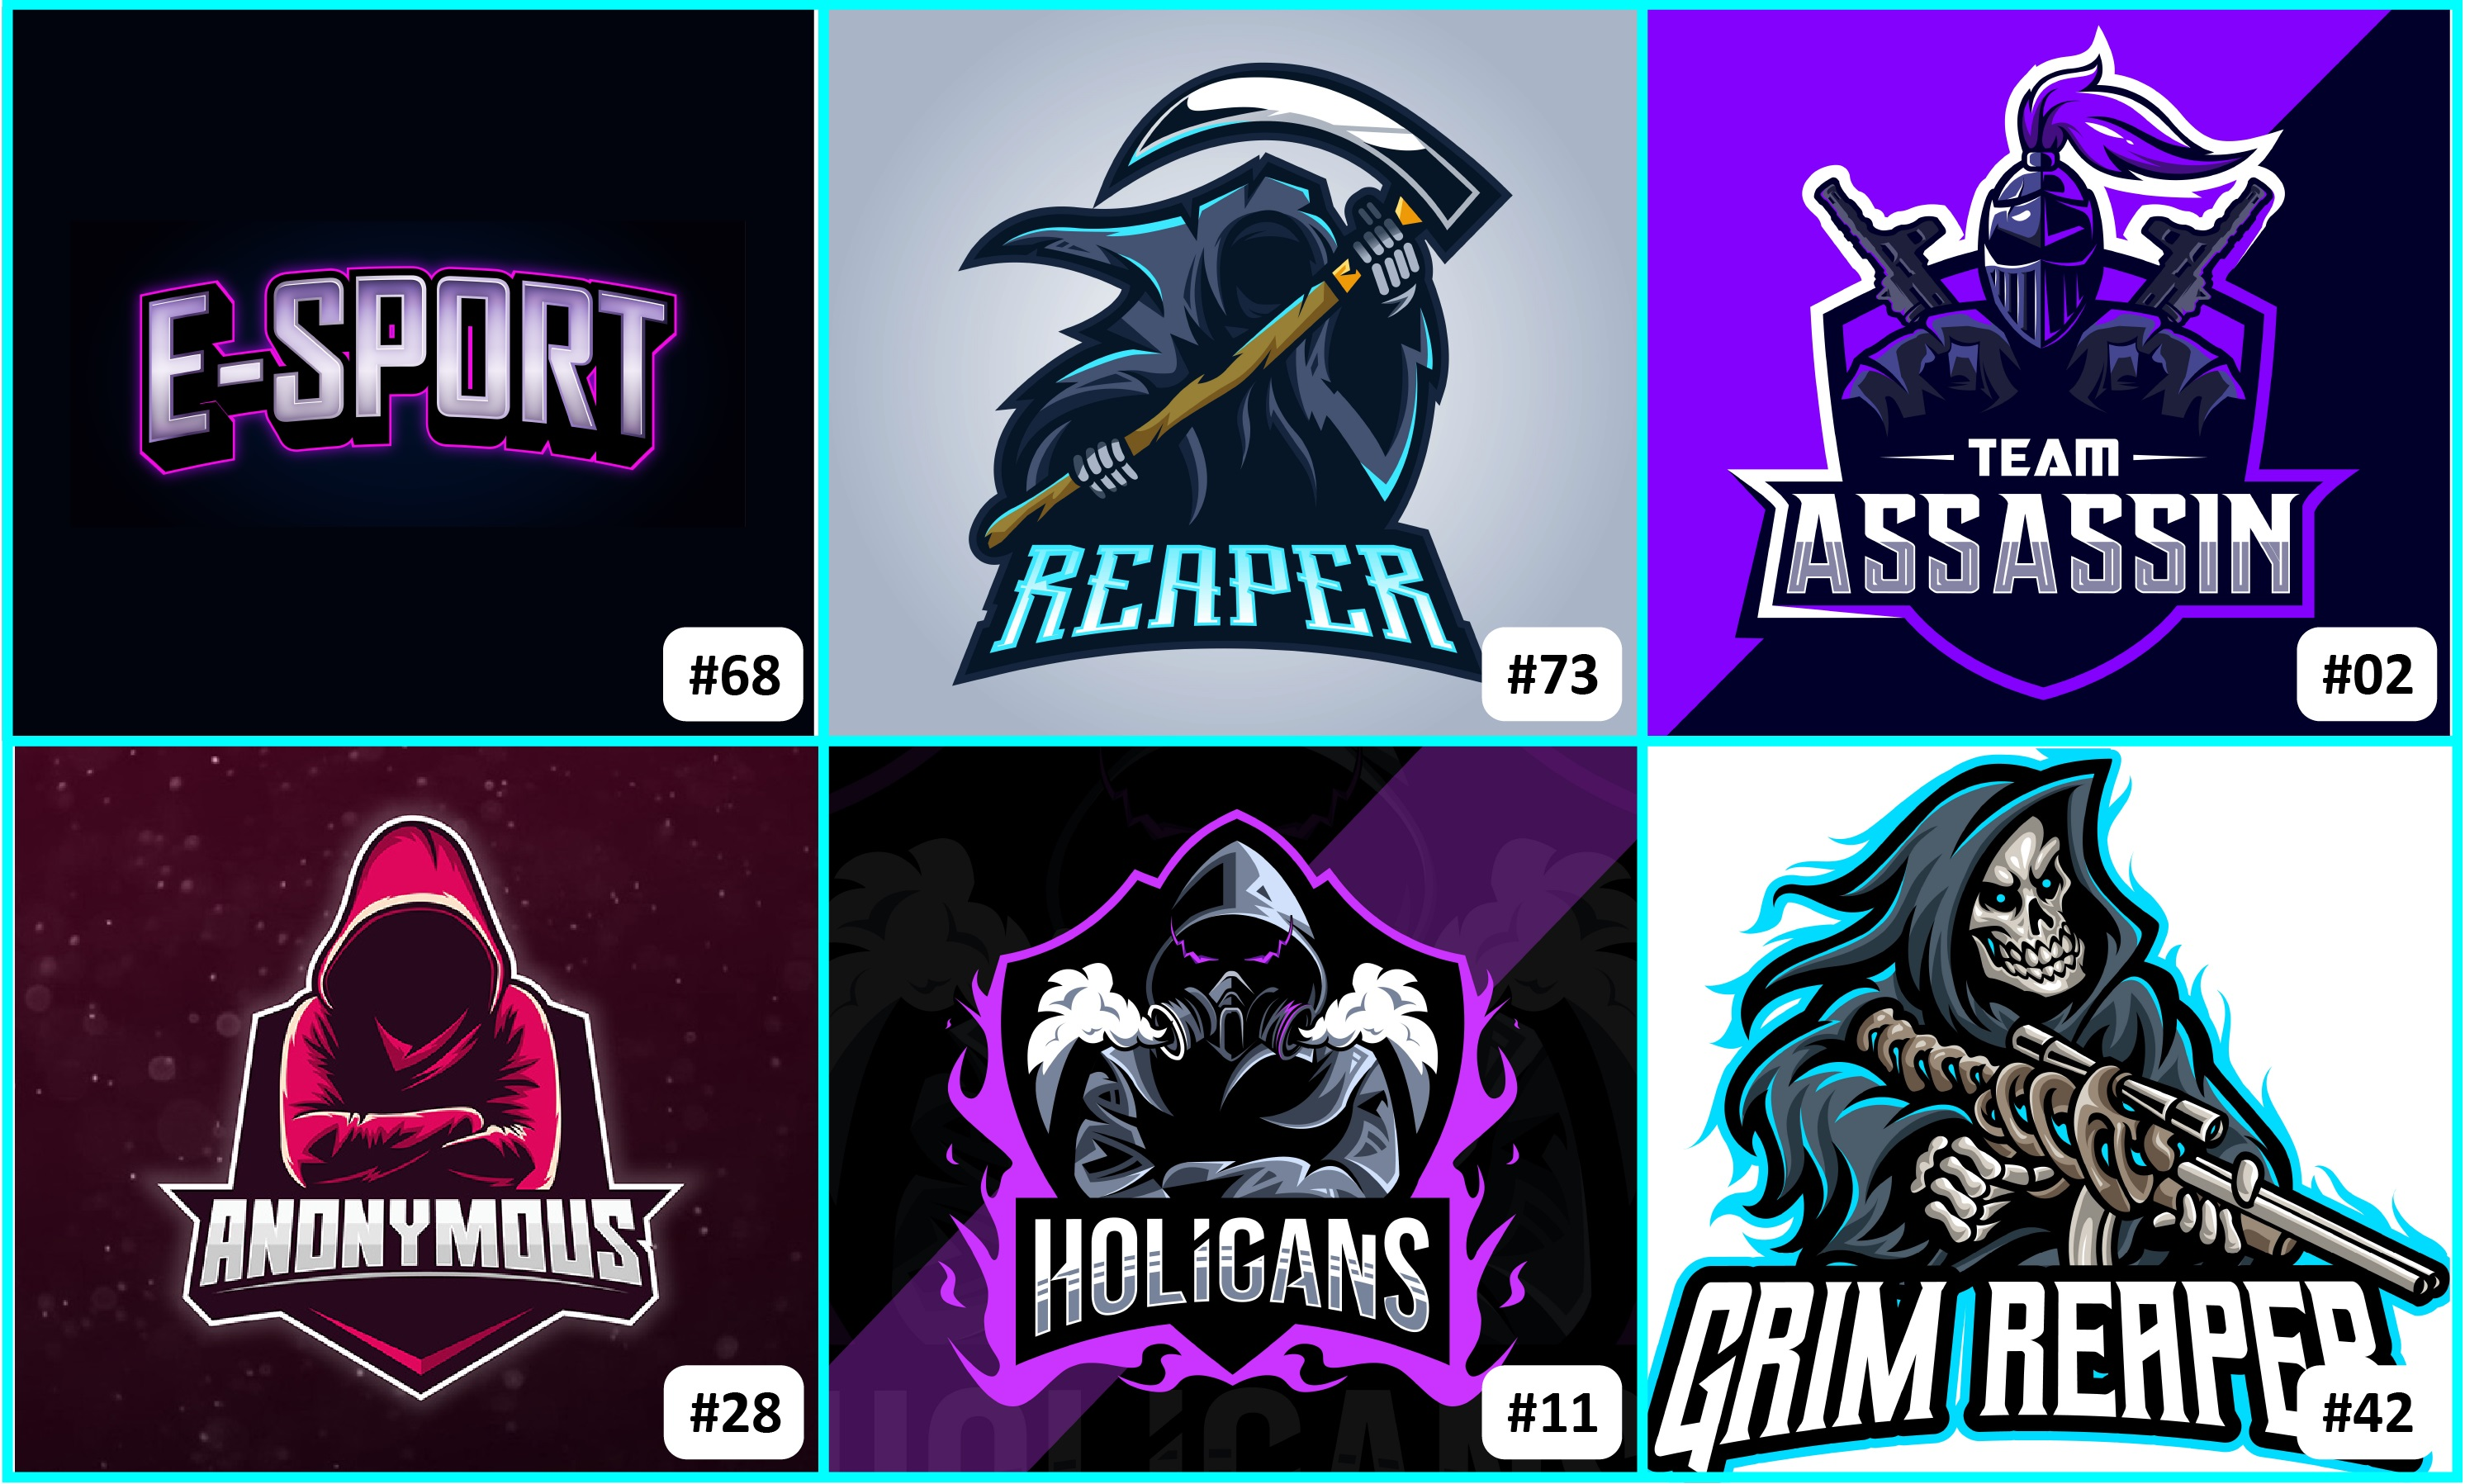 Design your esports gaming mascot logo at a cheap price